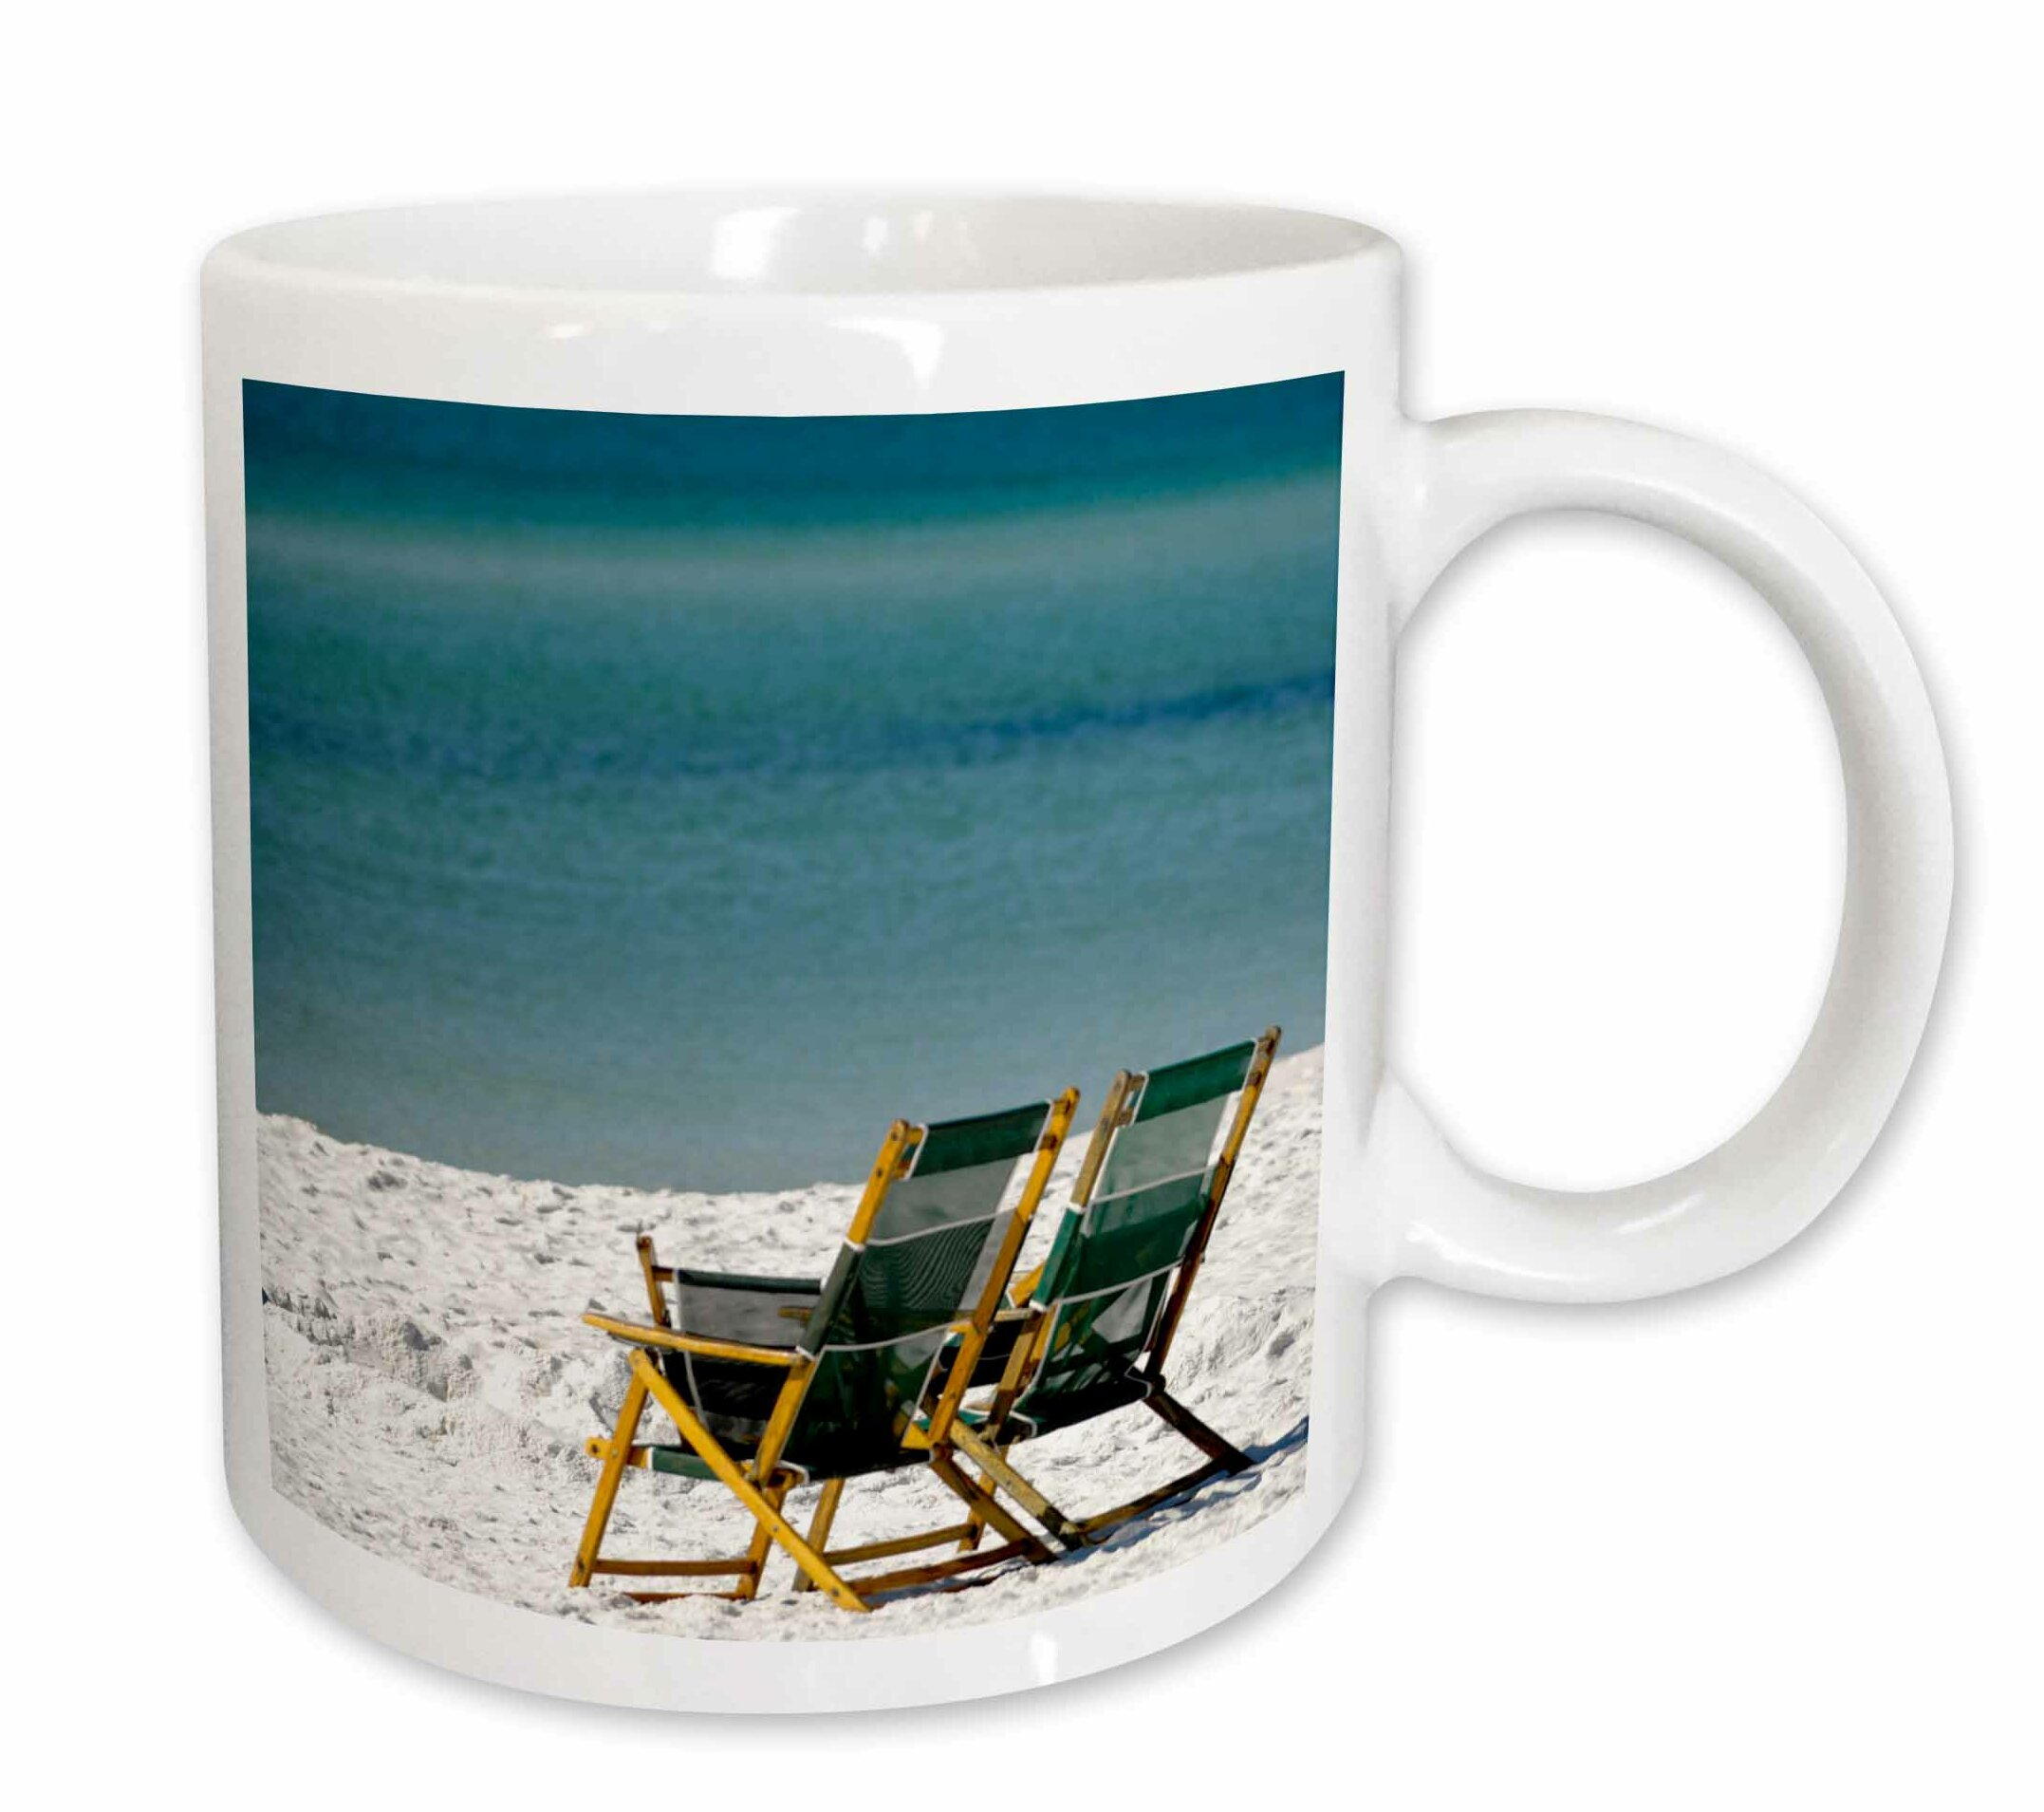 East Urban Home Adirondack Chairs Fort Walton Beach Florida Coffee